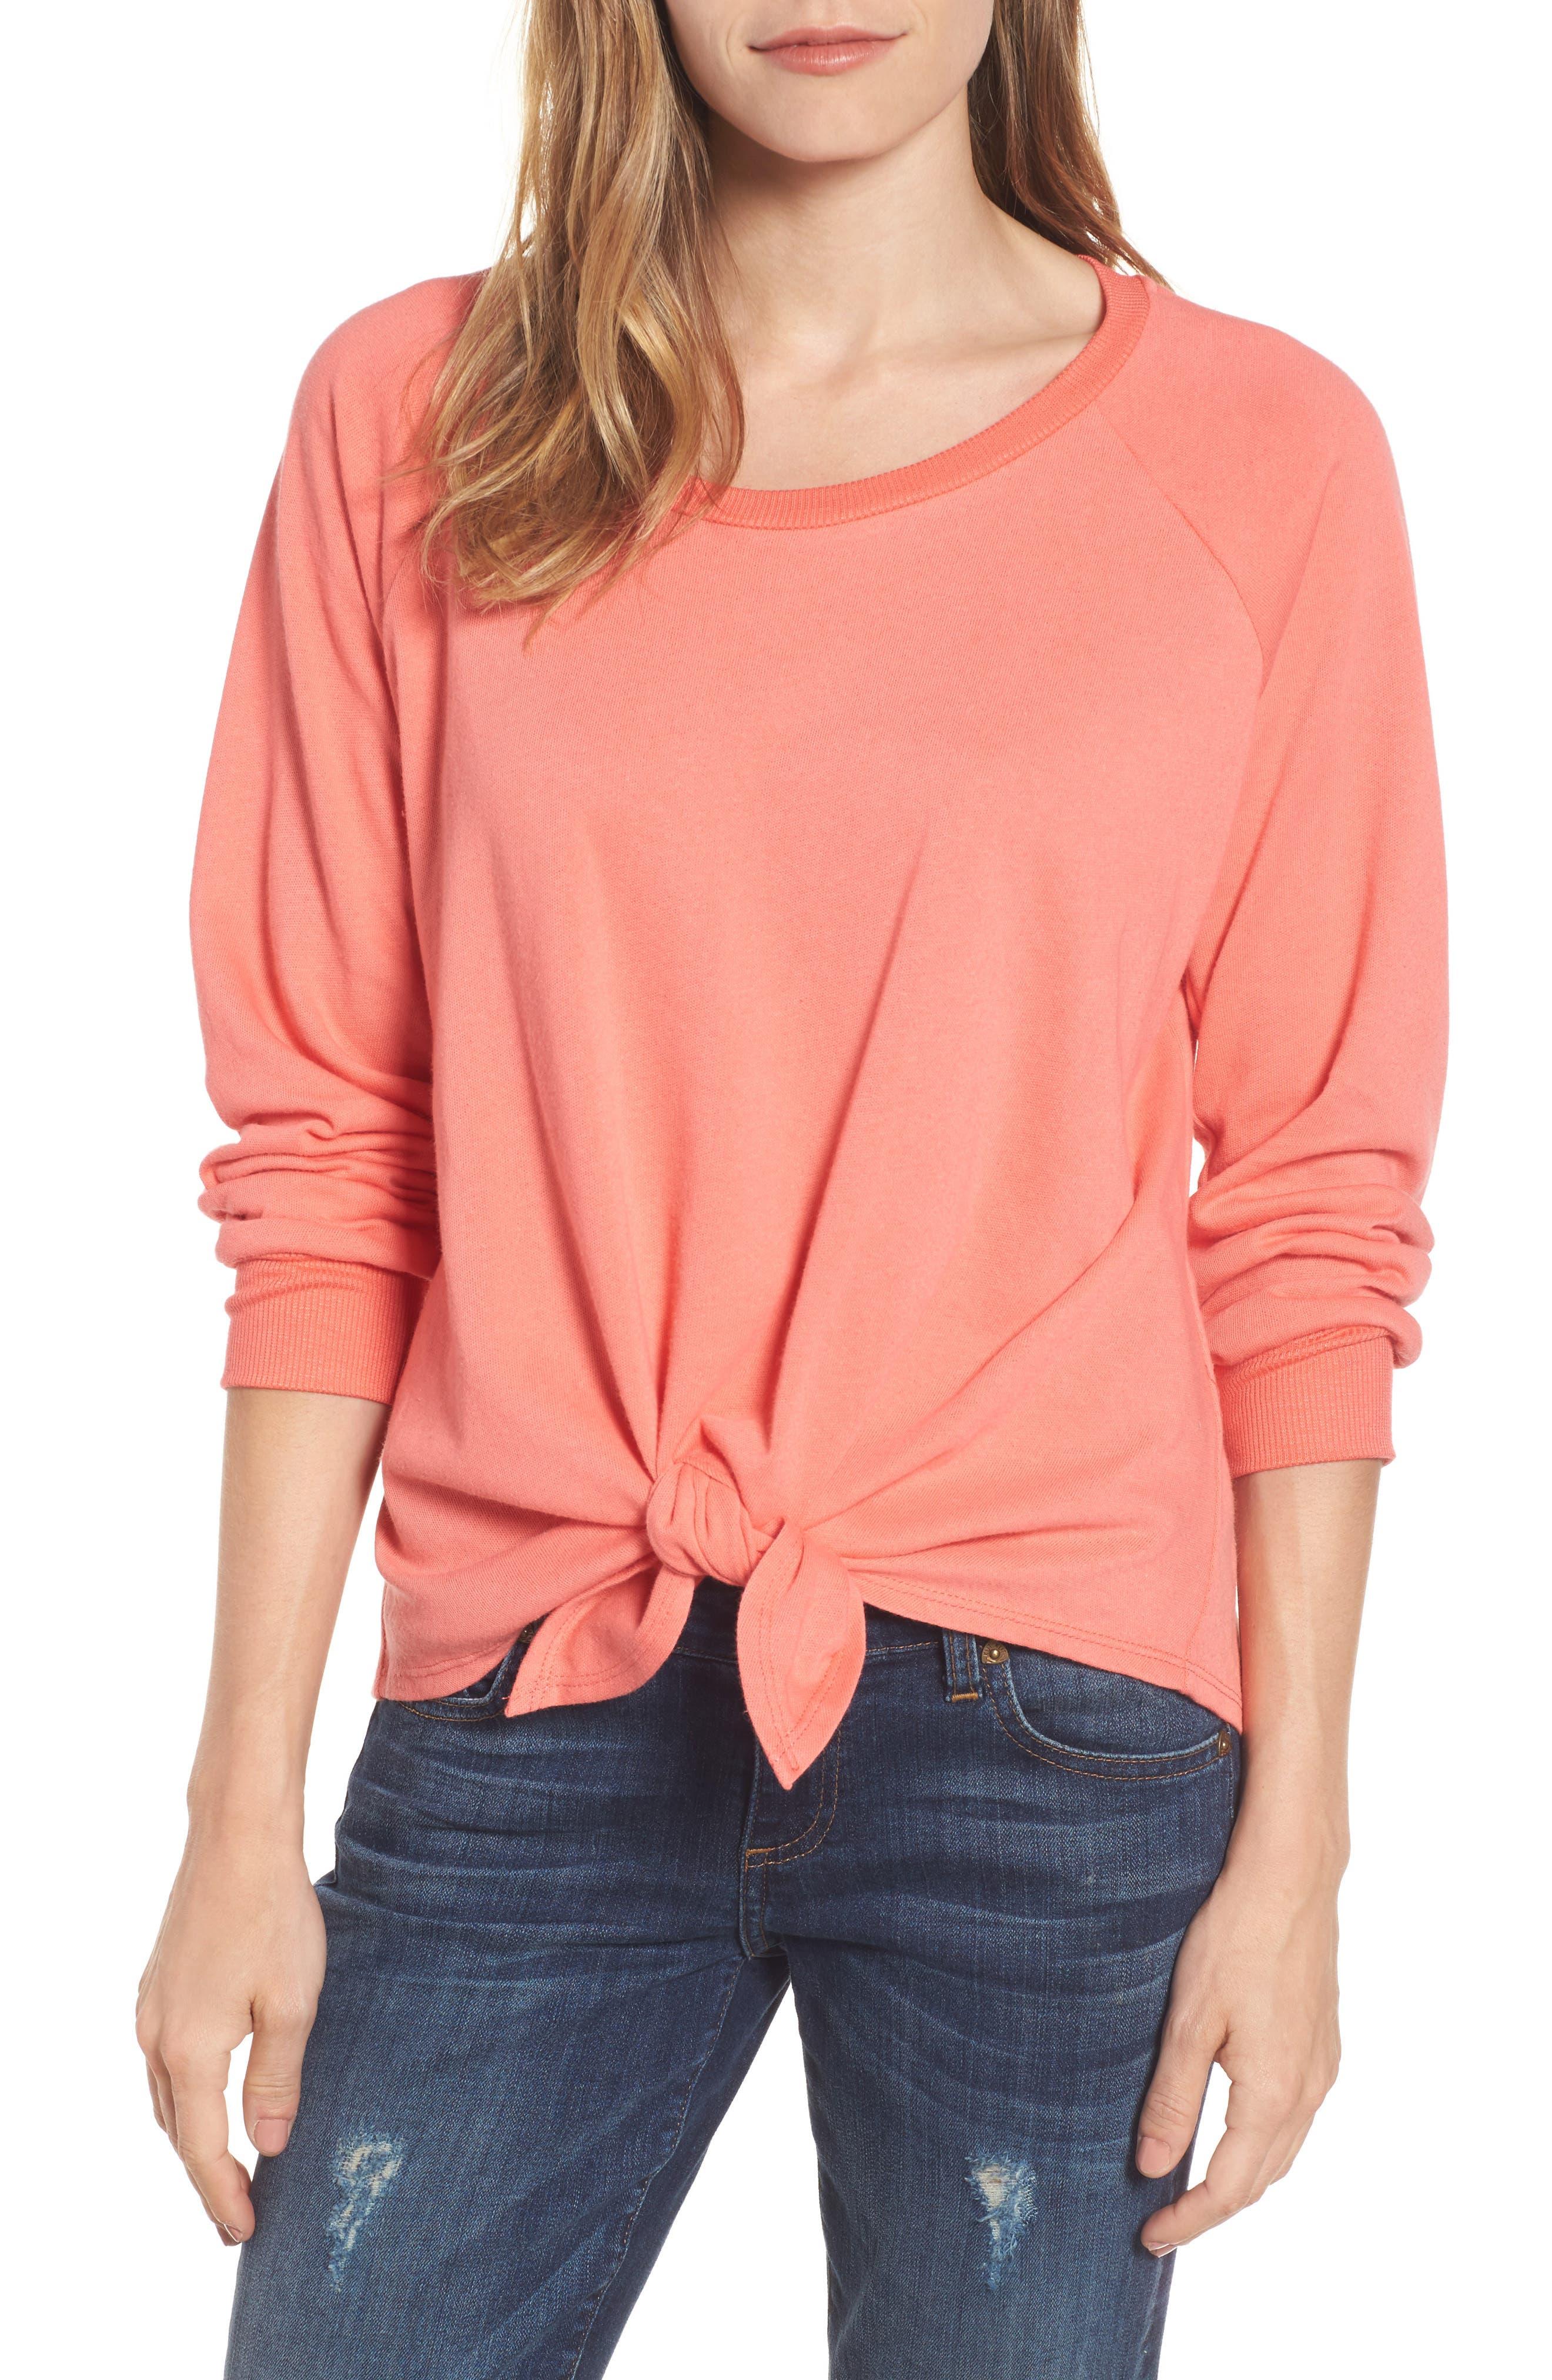 Main Image - Caslon® Tie Front Cotton Blend Sweatshirt (Regular & Petite)